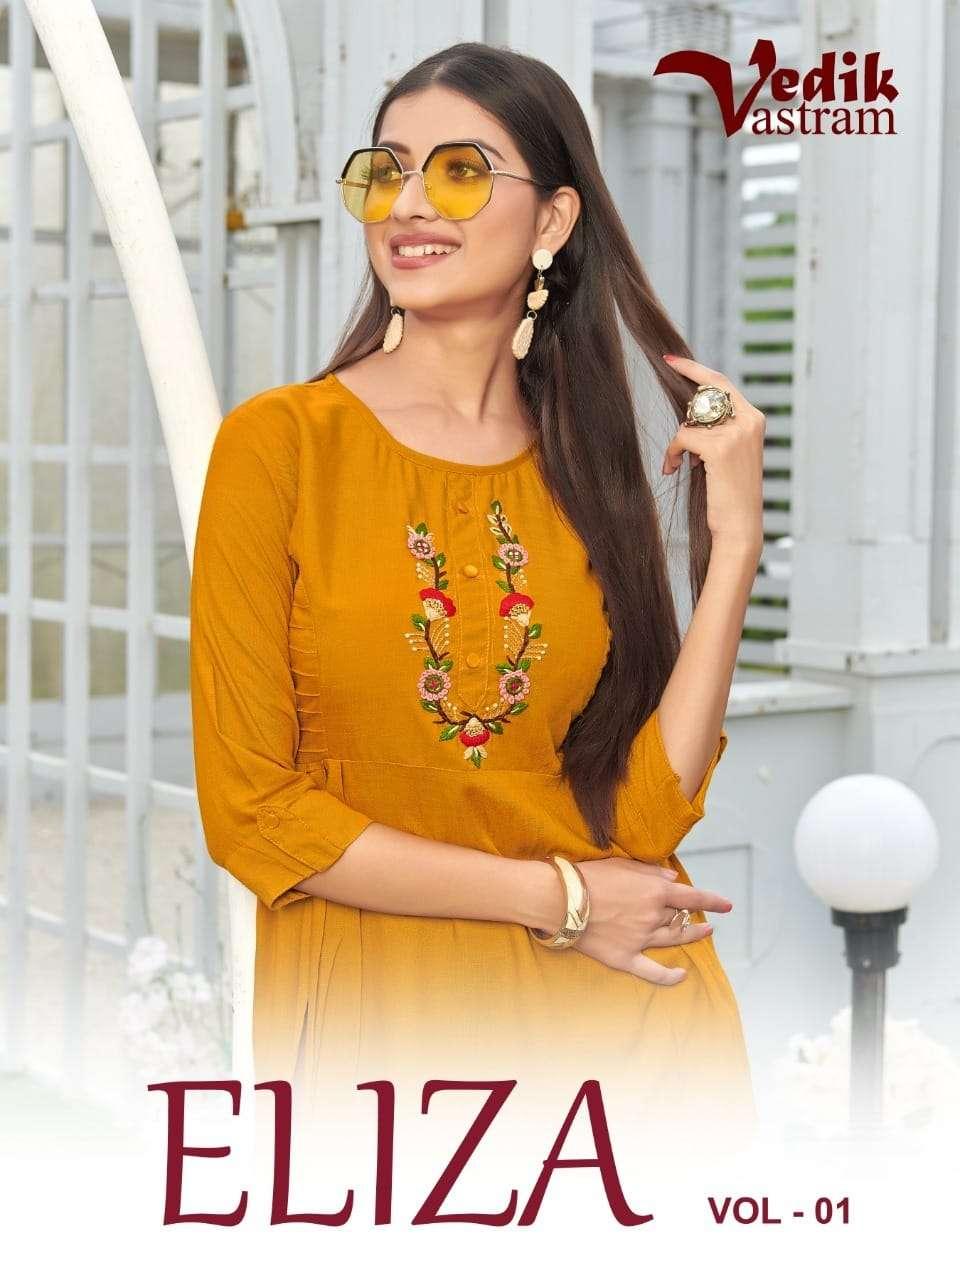 Eliza Vol 1 By Vedik Vastram short tops collection